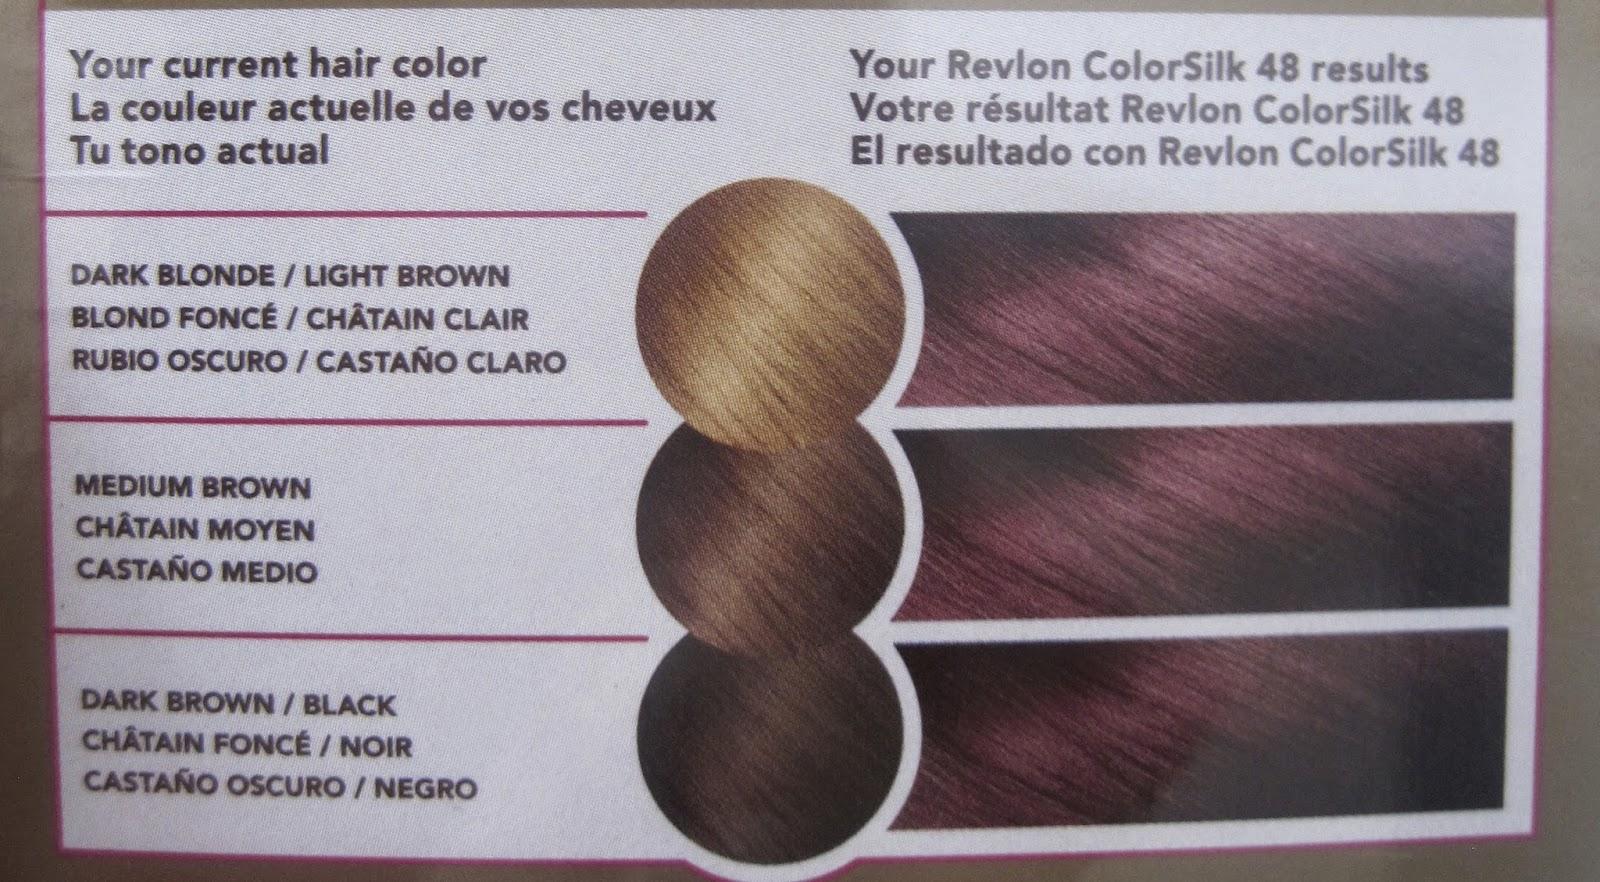 To Flawless Review Revlon Colorsilk Burgundy